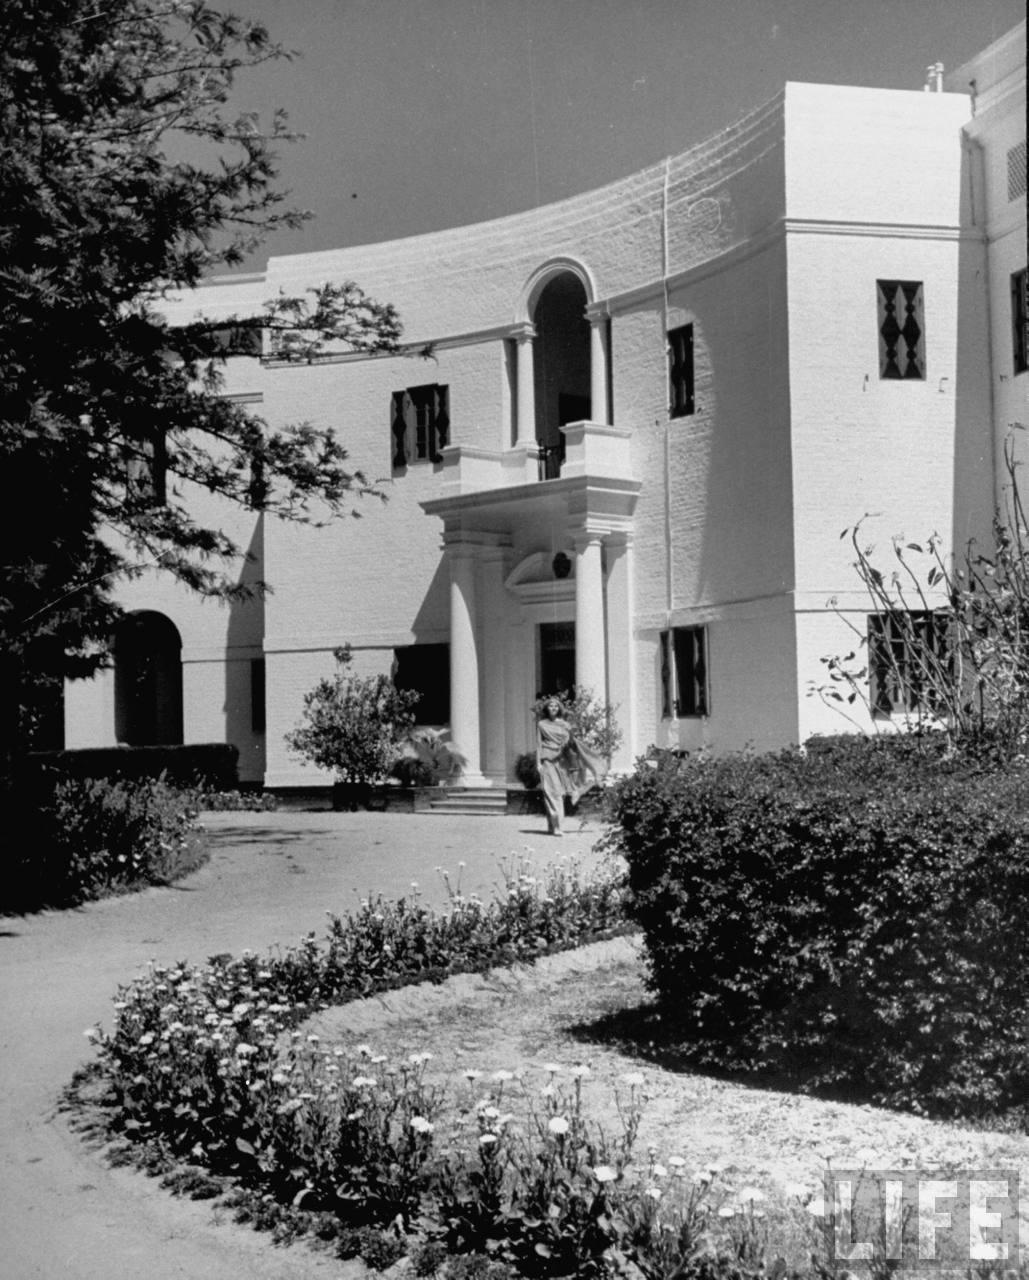 Palatial home of Mohammed Ali Jinnah